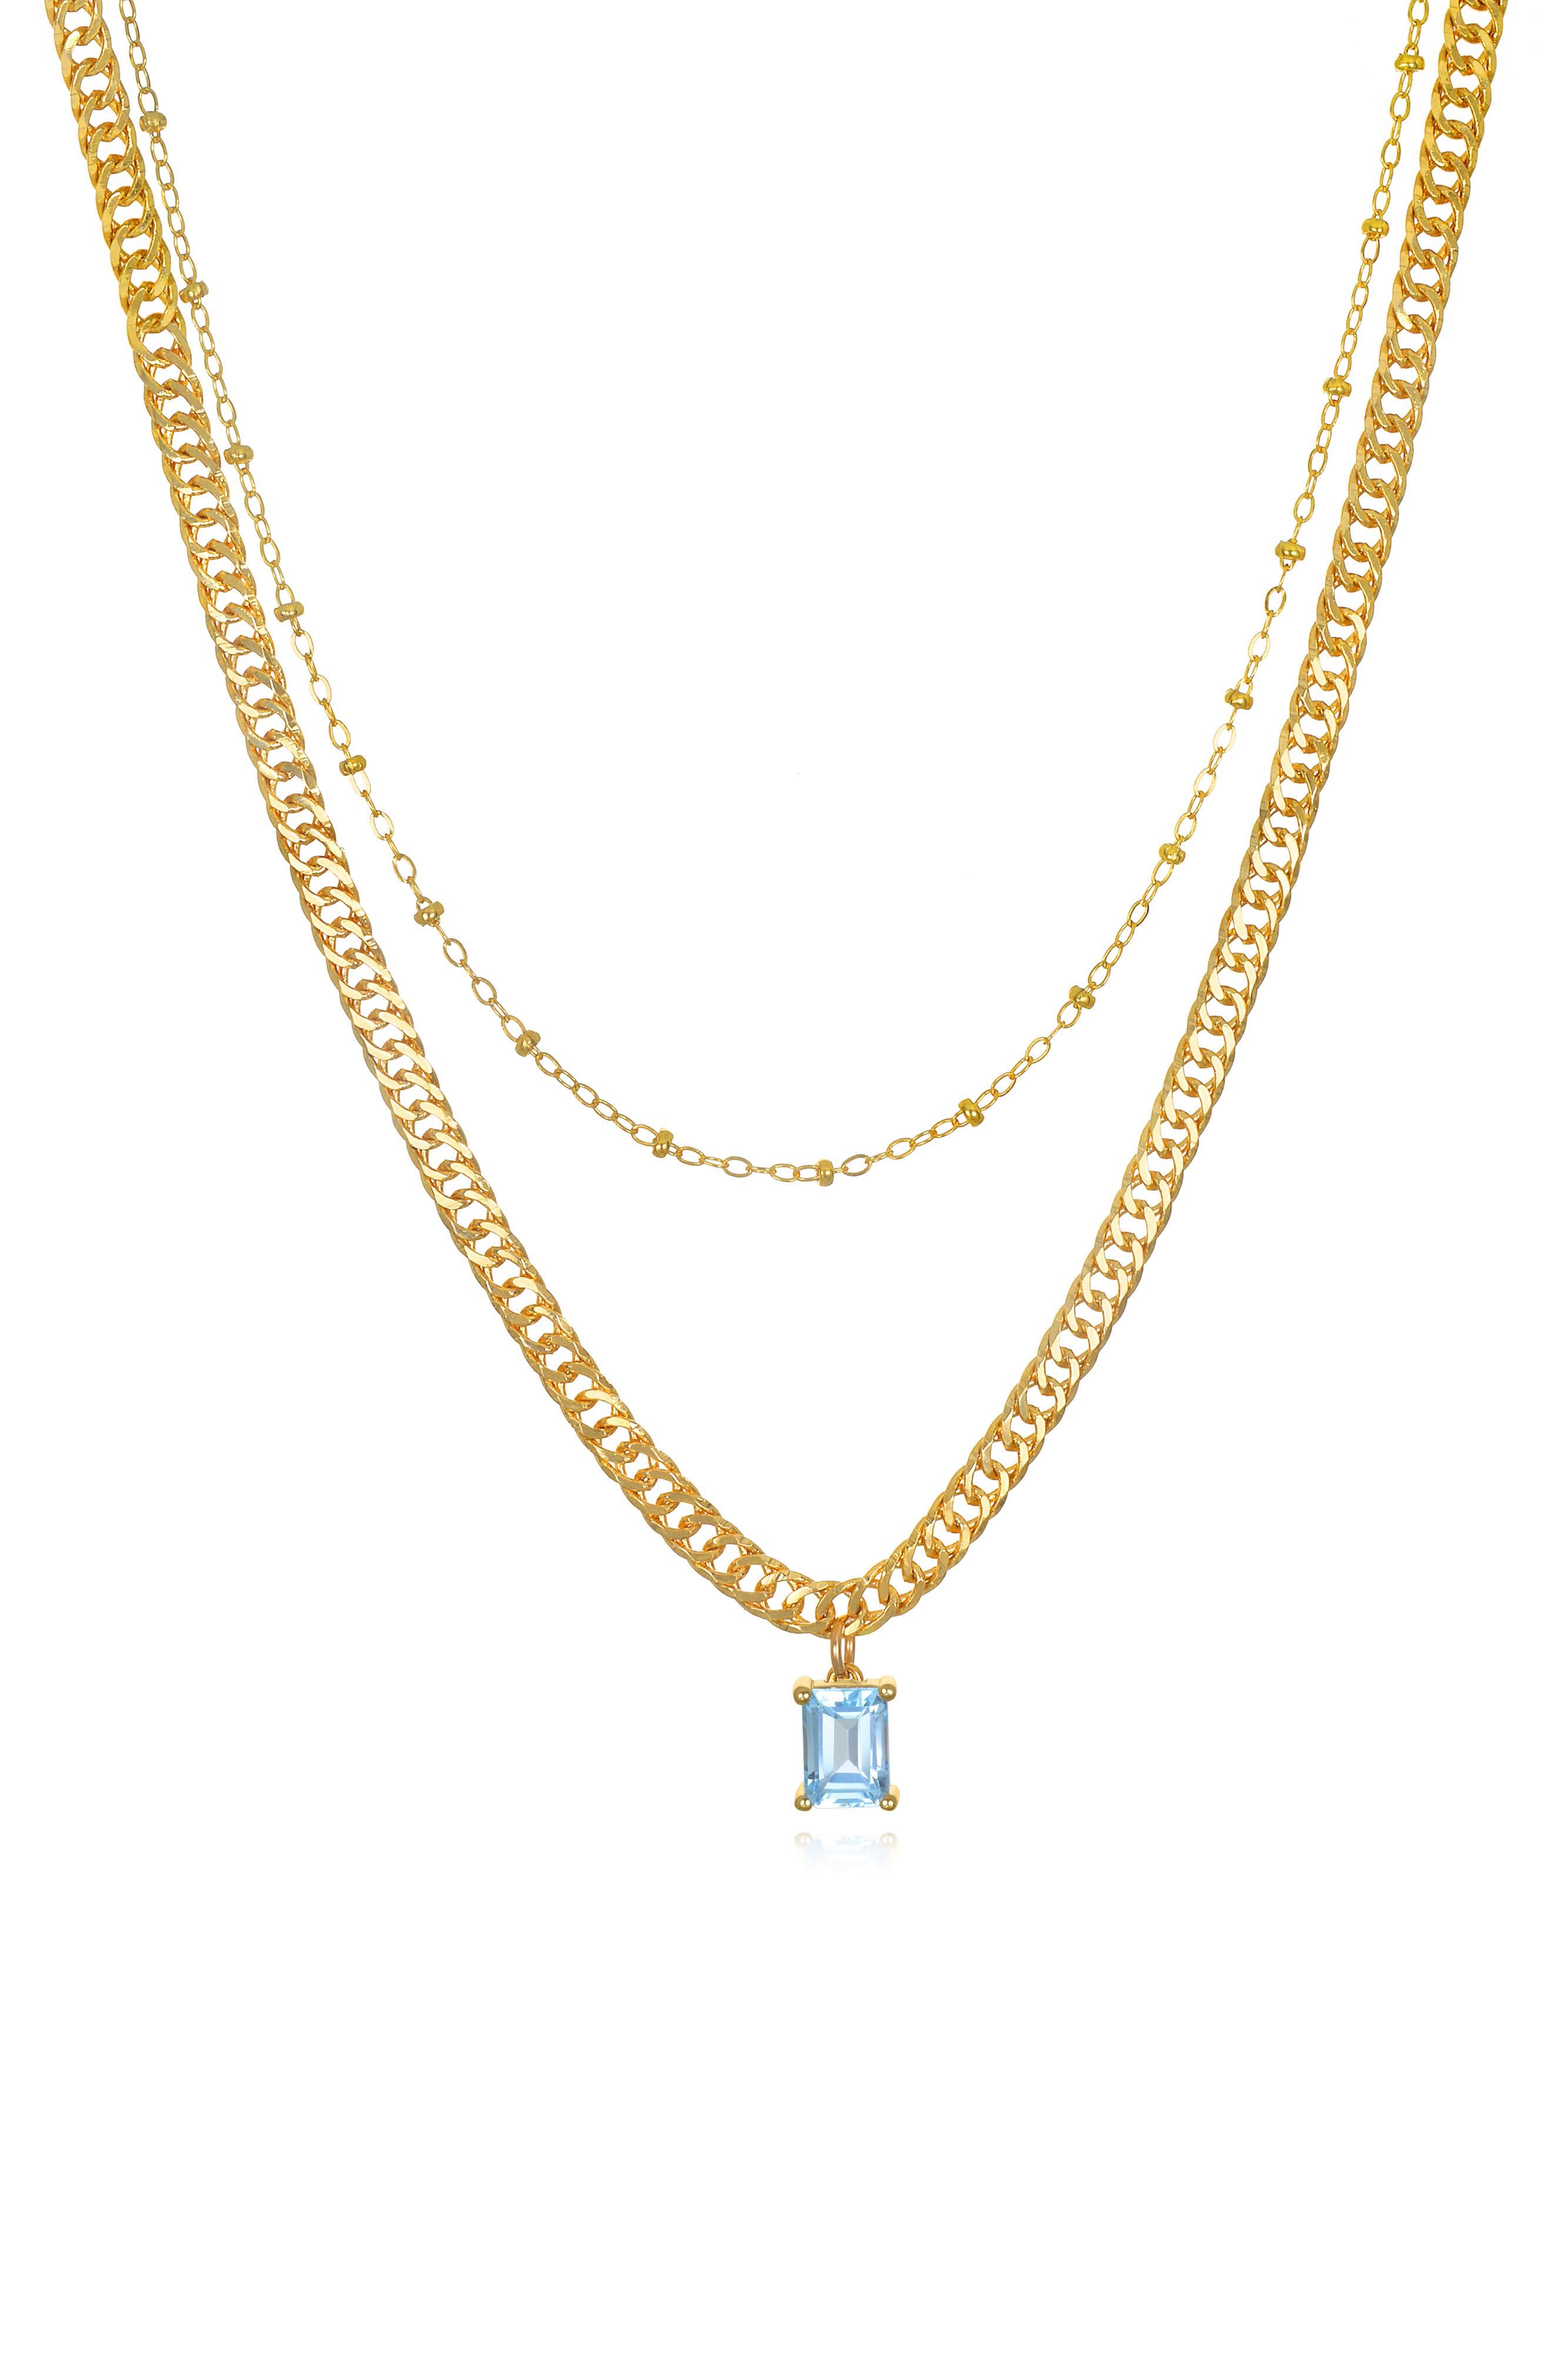 Amelia Rose Layered Curb Necklace in Rose Quartz at Nordstrom